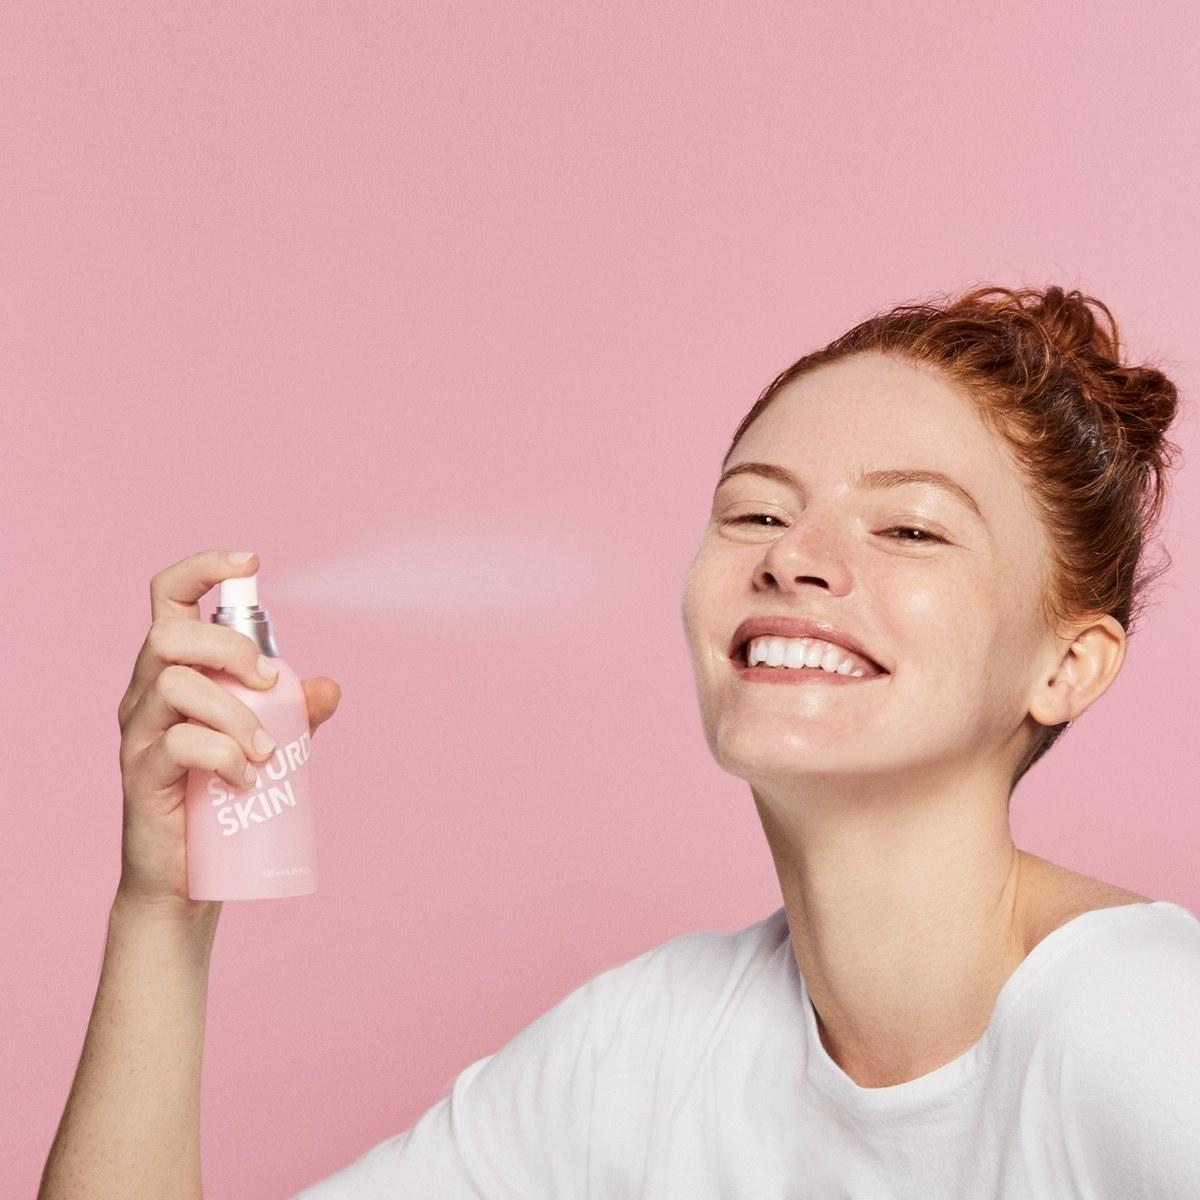 model spraying the bottle on her face